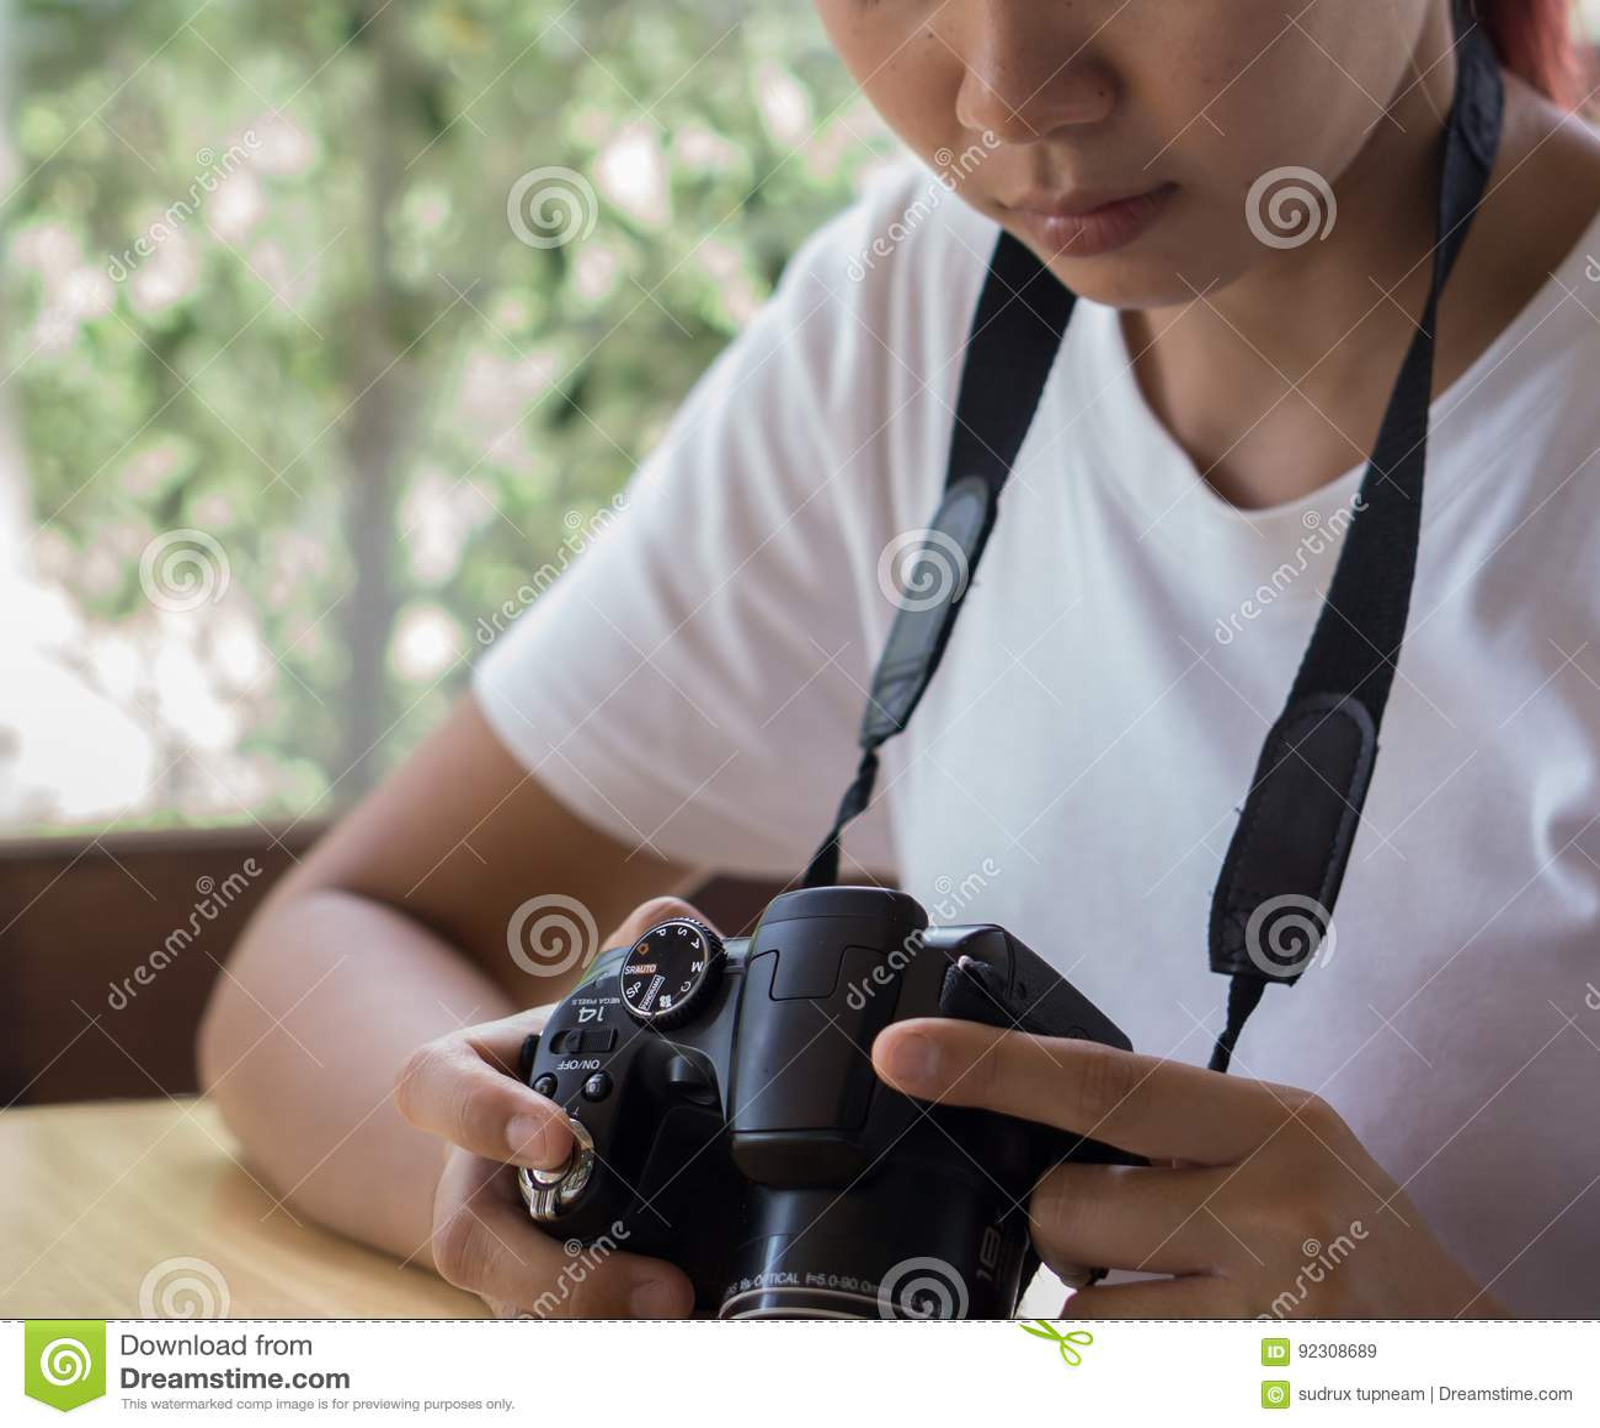 Asian Amateur asian teen is an amateur photographer practicing photography